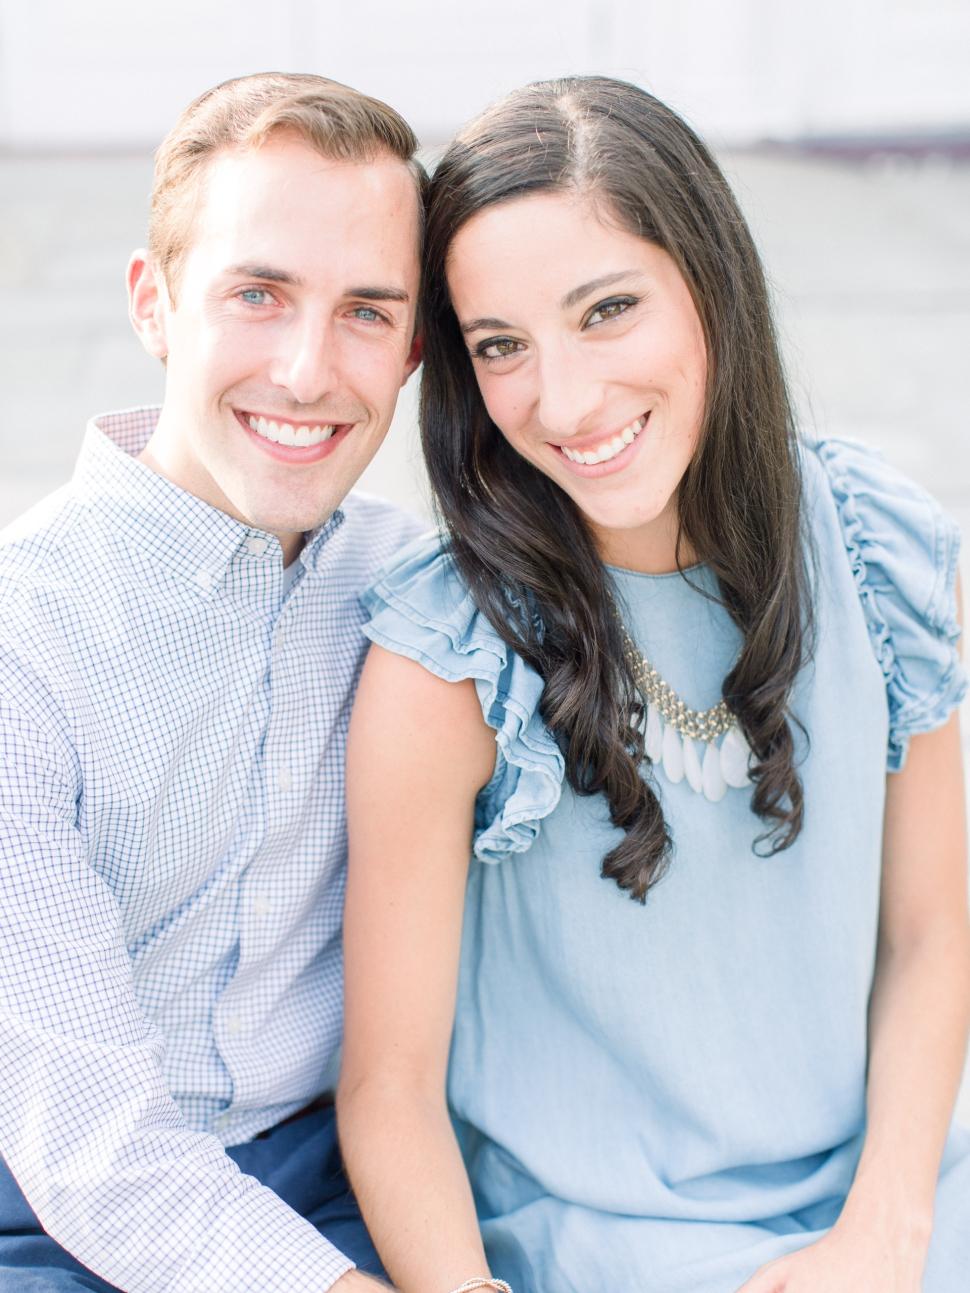 Philadelphia-Wedding-Photographer-Cassi-Claire-Saint-Josephs-University-Engagement_09.jpg